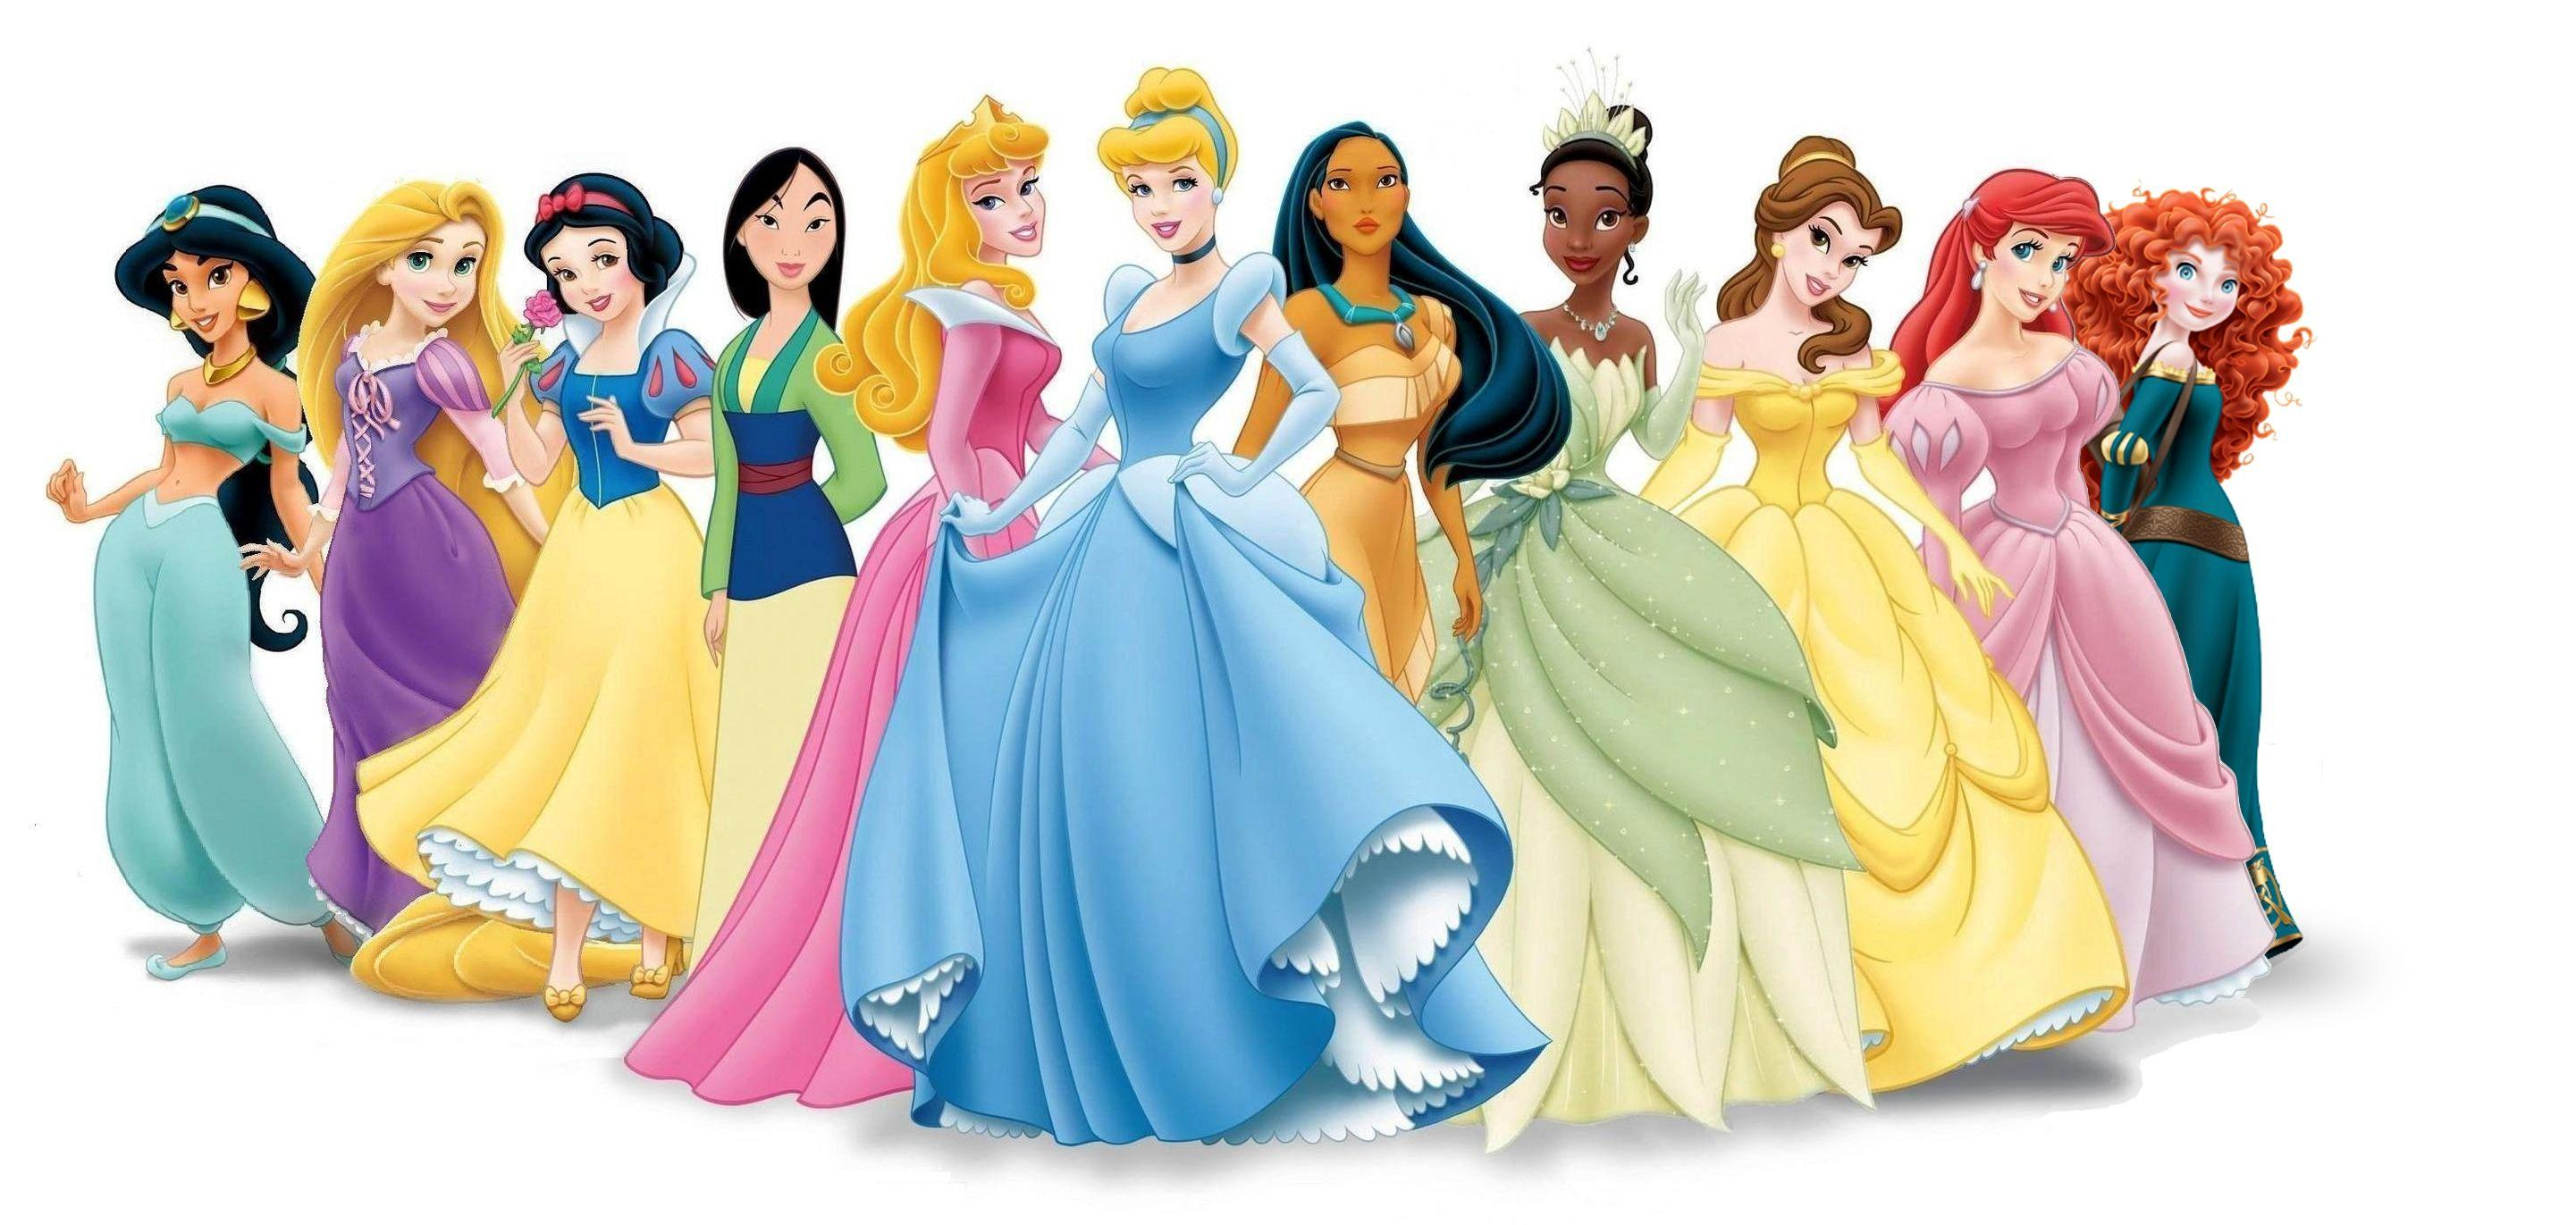 Disney Princess Hd Wallpapers Wallpaper Cave